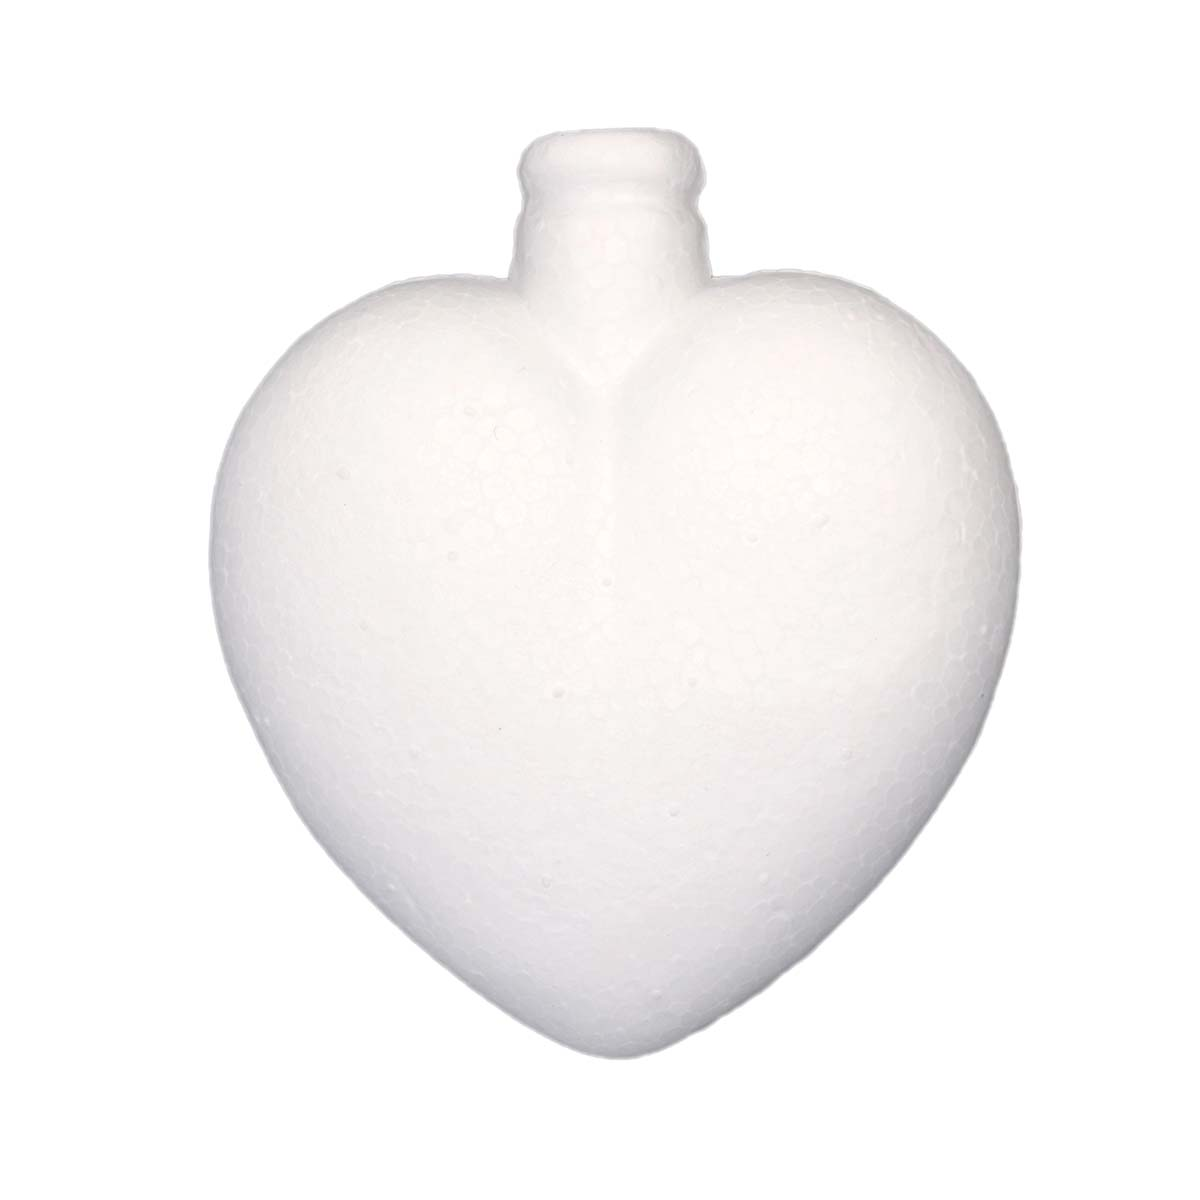 Сердце (подвеска) h 6,5*6см 2 шт/упак